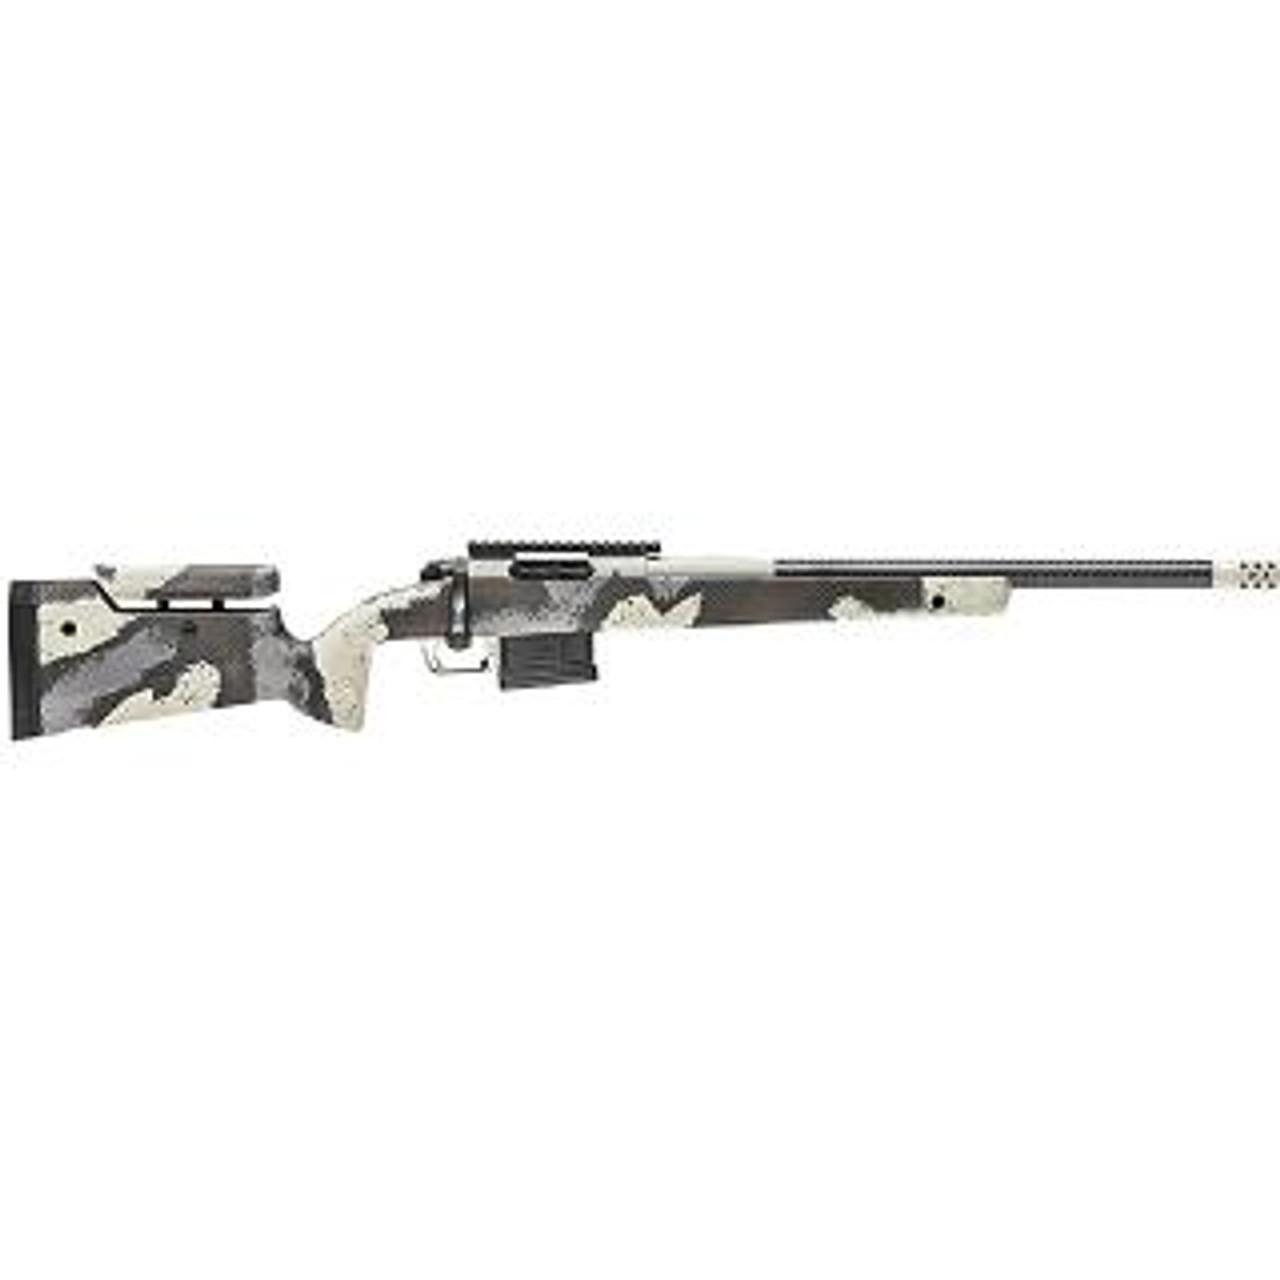 Springfield Model 2020 Waypoint CF ADJ CALIFORNIA LEGAL - 6mm Creedmoor - Ridgeline Camo